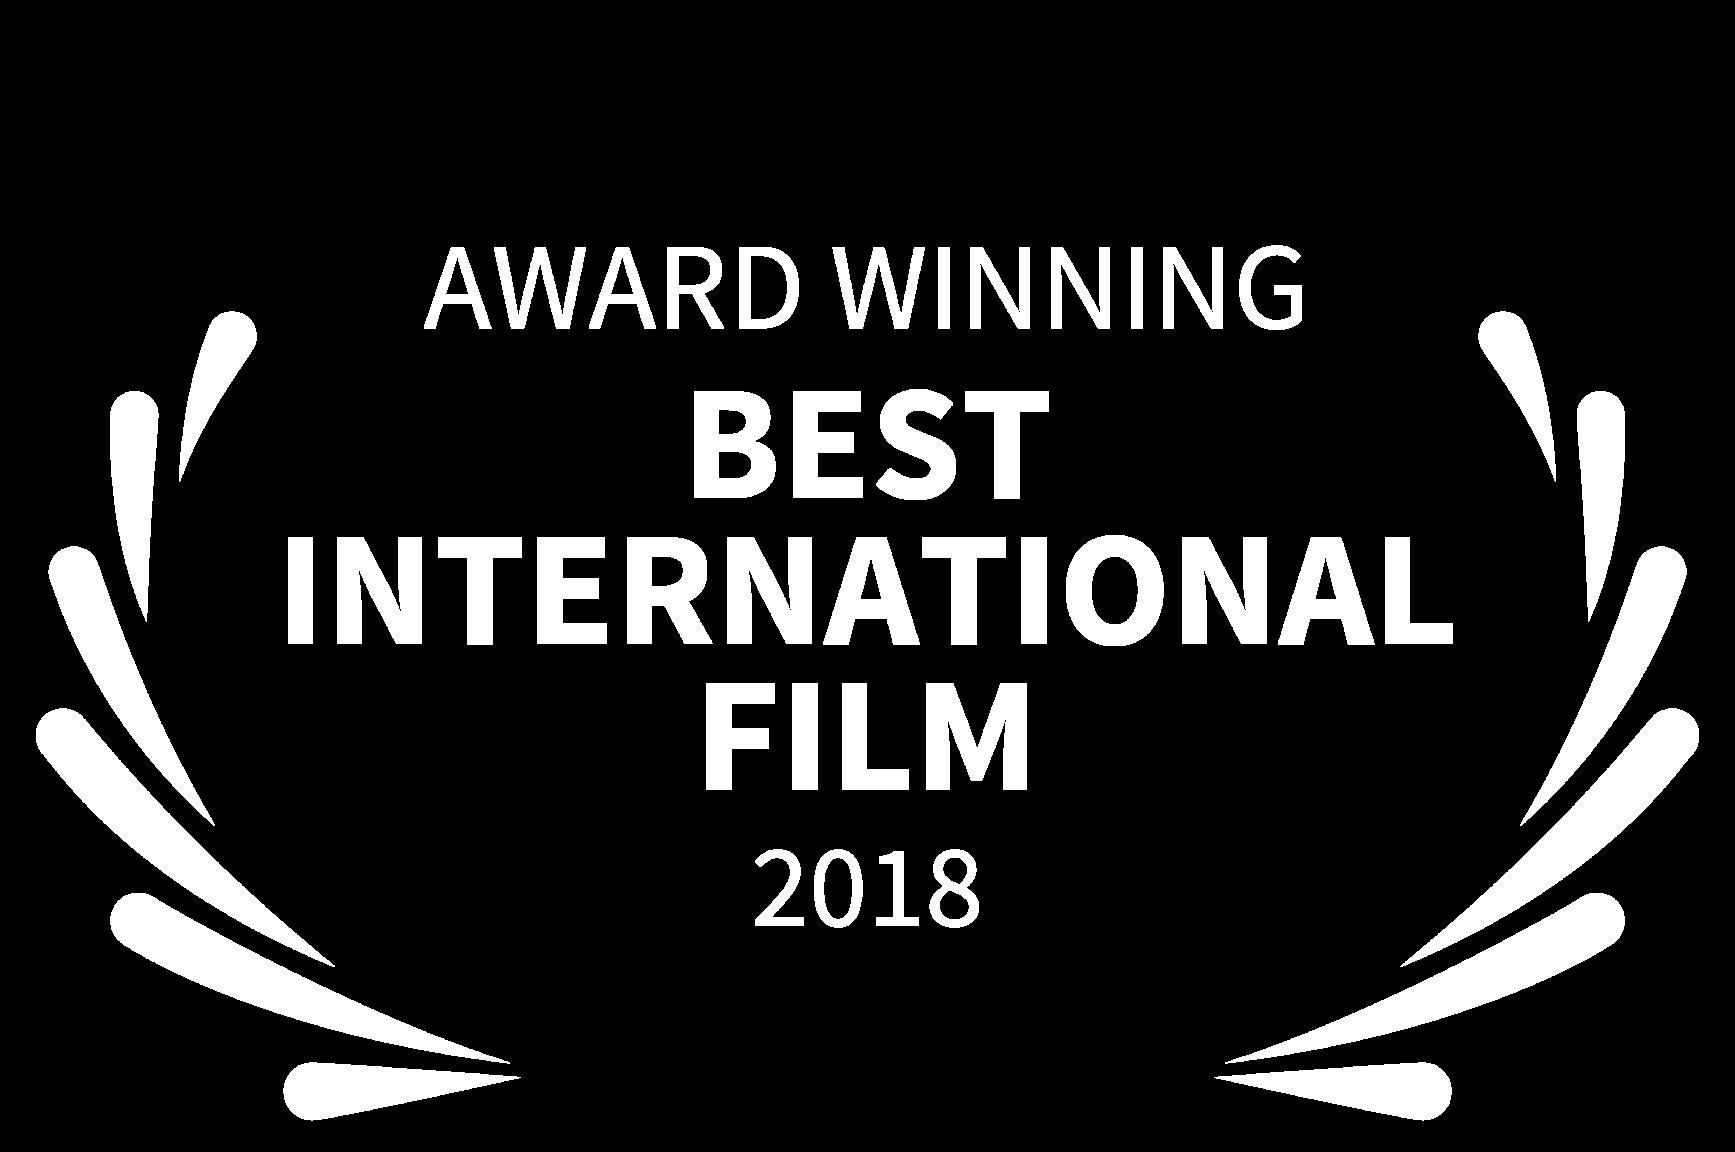 AWARD WINNING - BEST INTERNATIONAL FILM - 2018.png